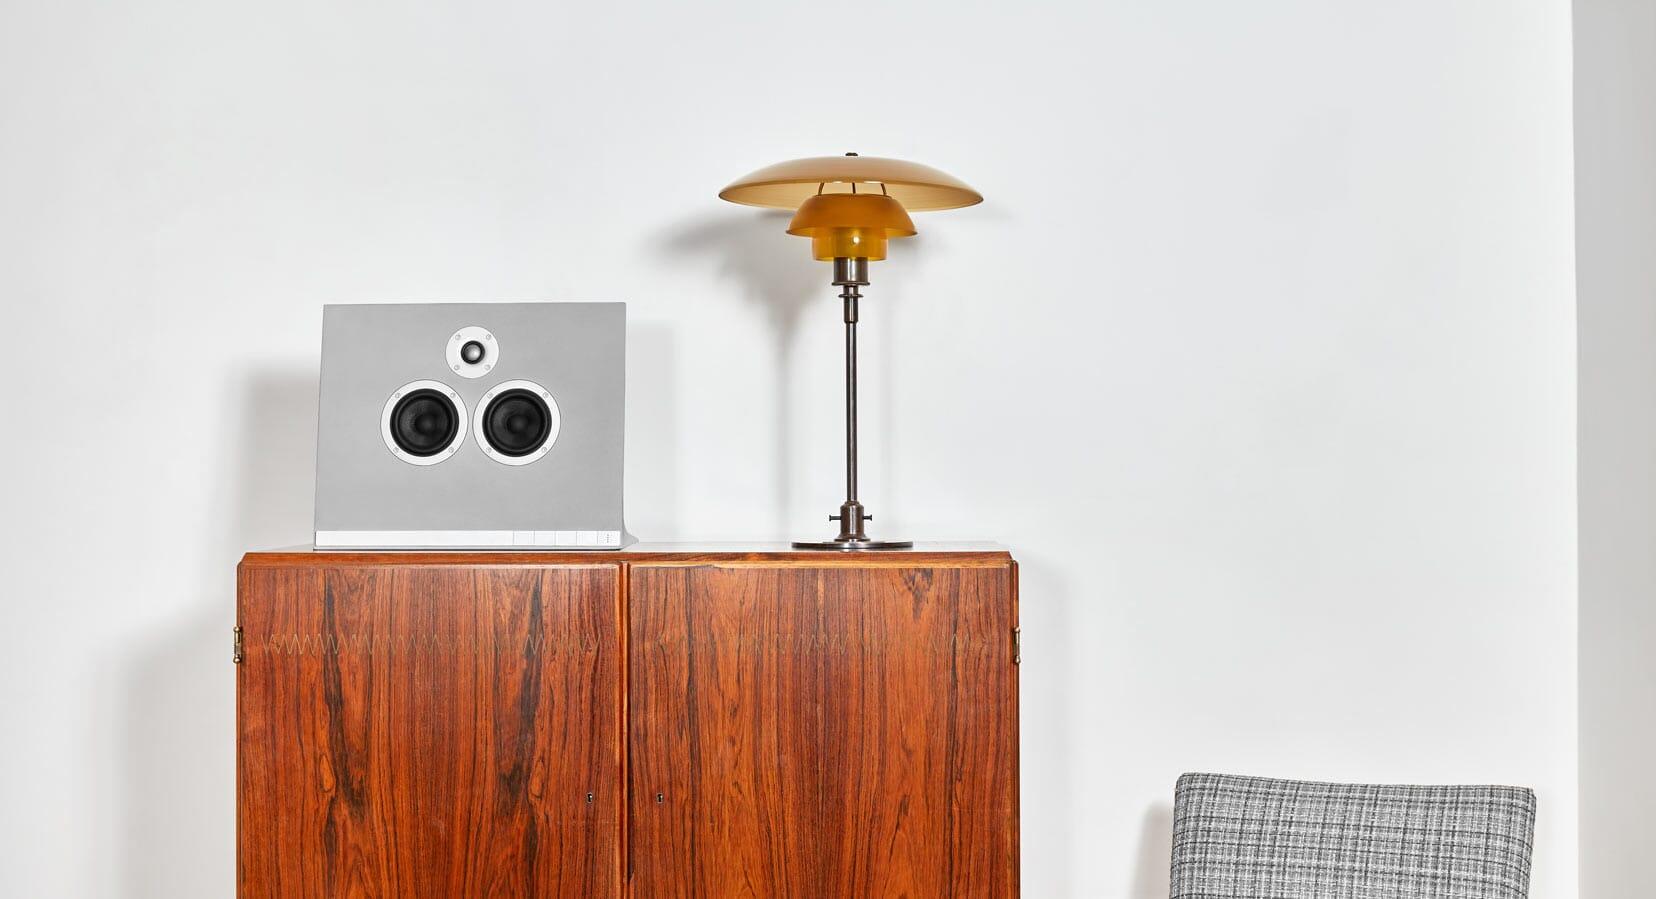 Master & Dynamic Unveil the Concrete MA770 Speaker